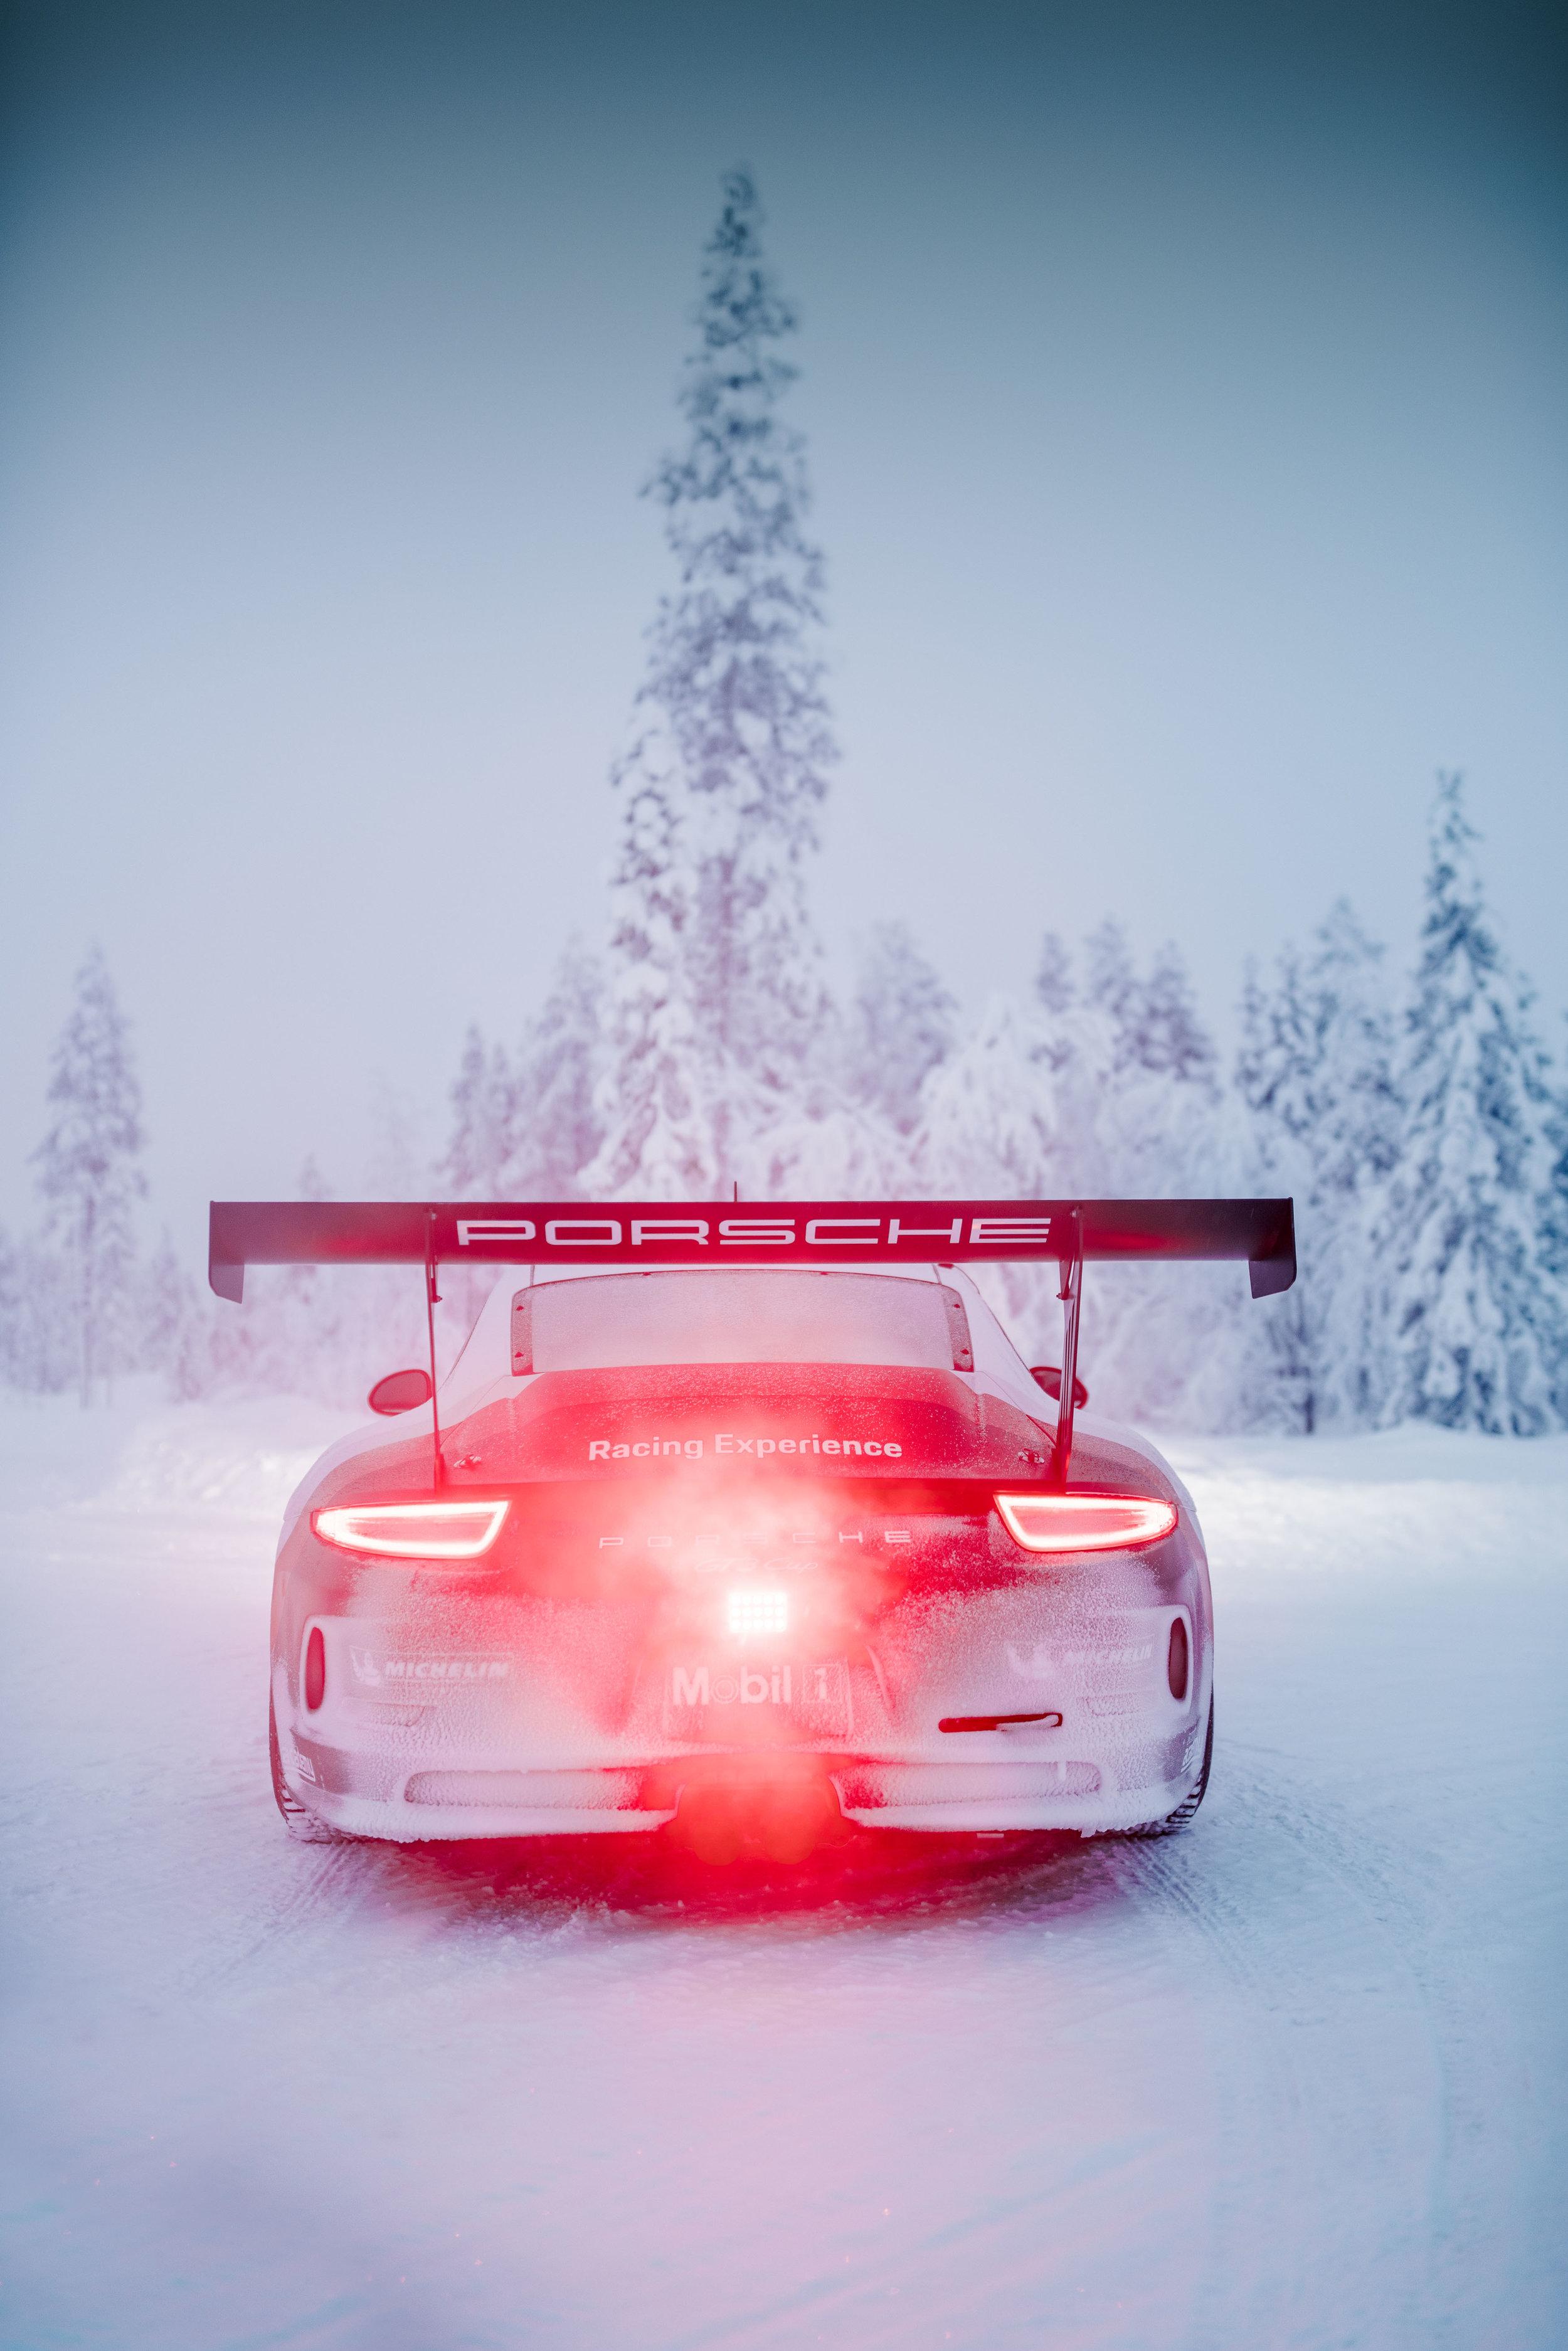 Porsche Ice Experience on Ice_30_01_2019_0160_175625.jpg